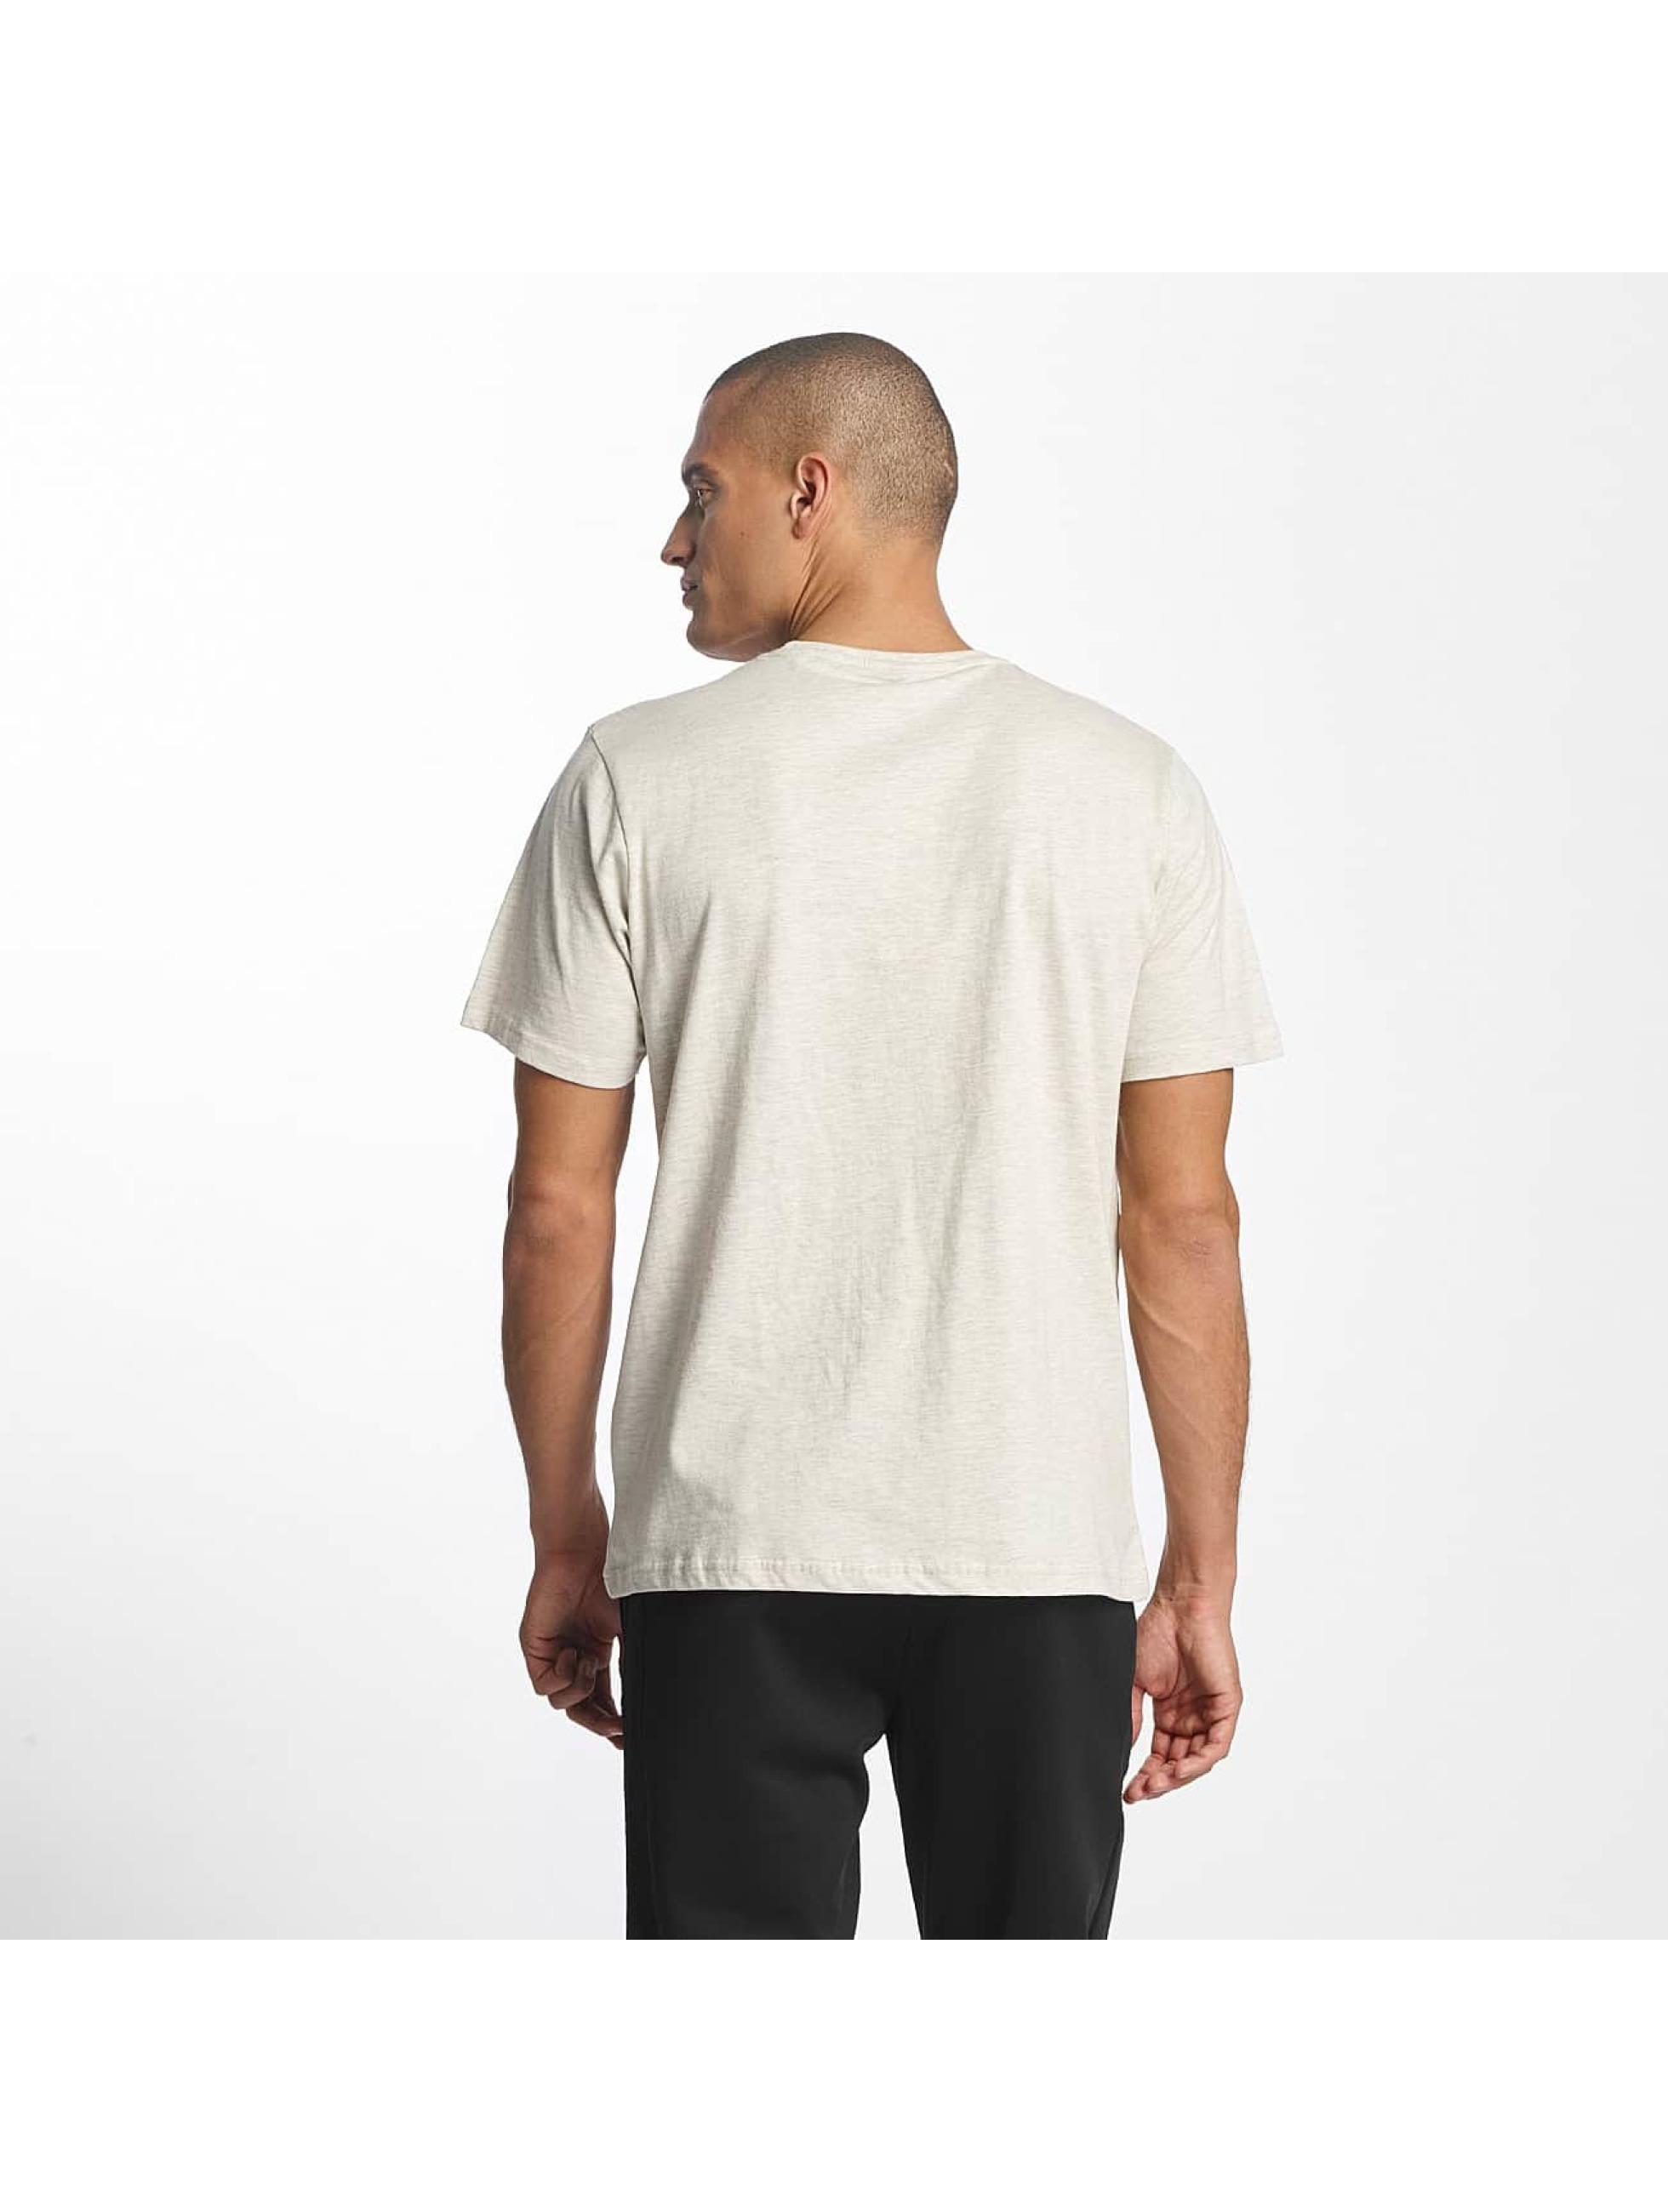 Ellesse t-shirt Prado beige